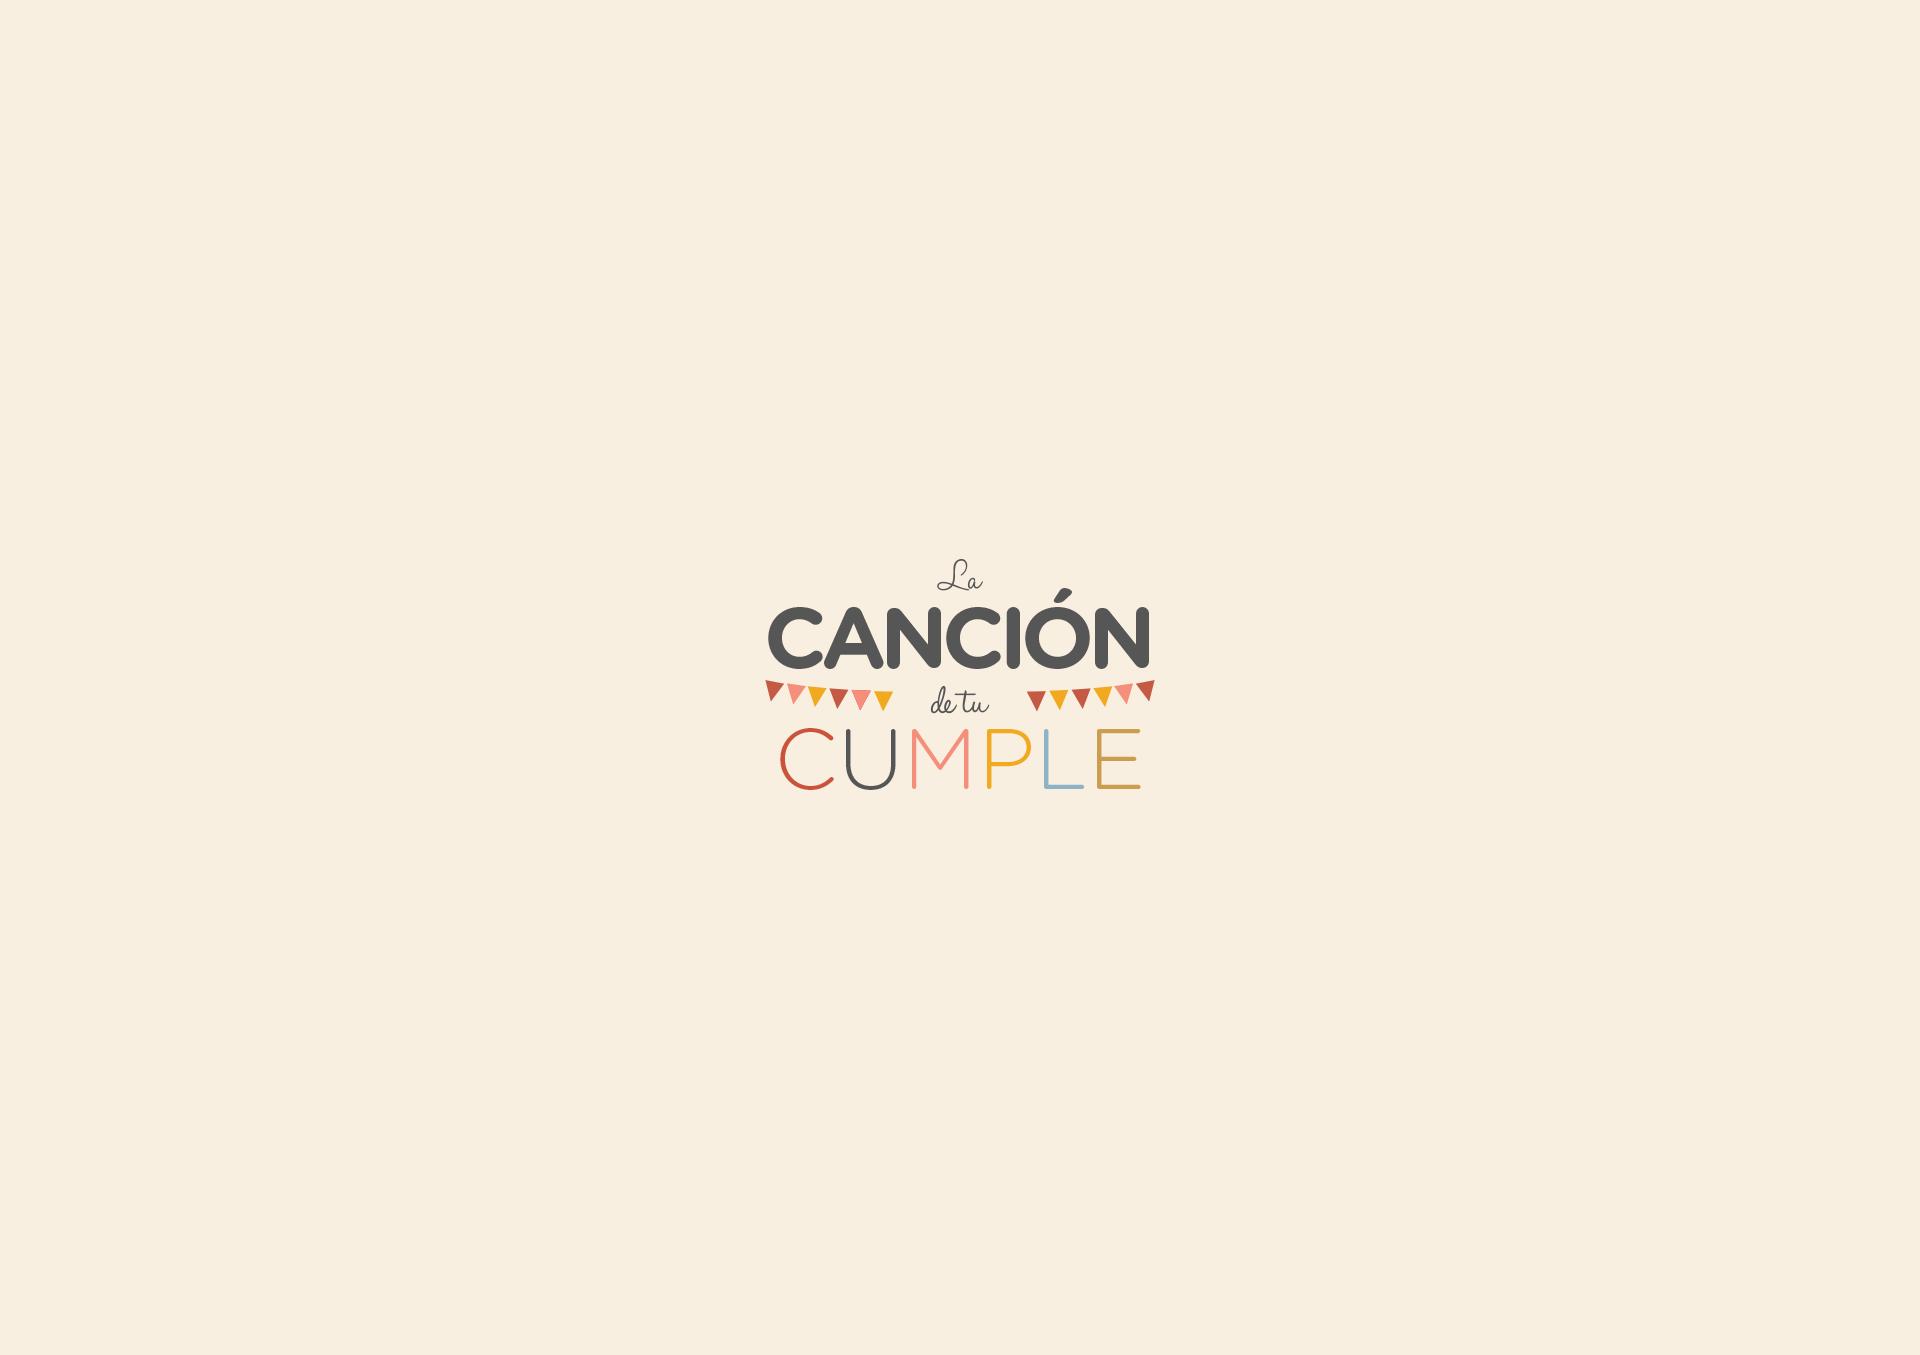 logotipo_la_cancion_cumple_7